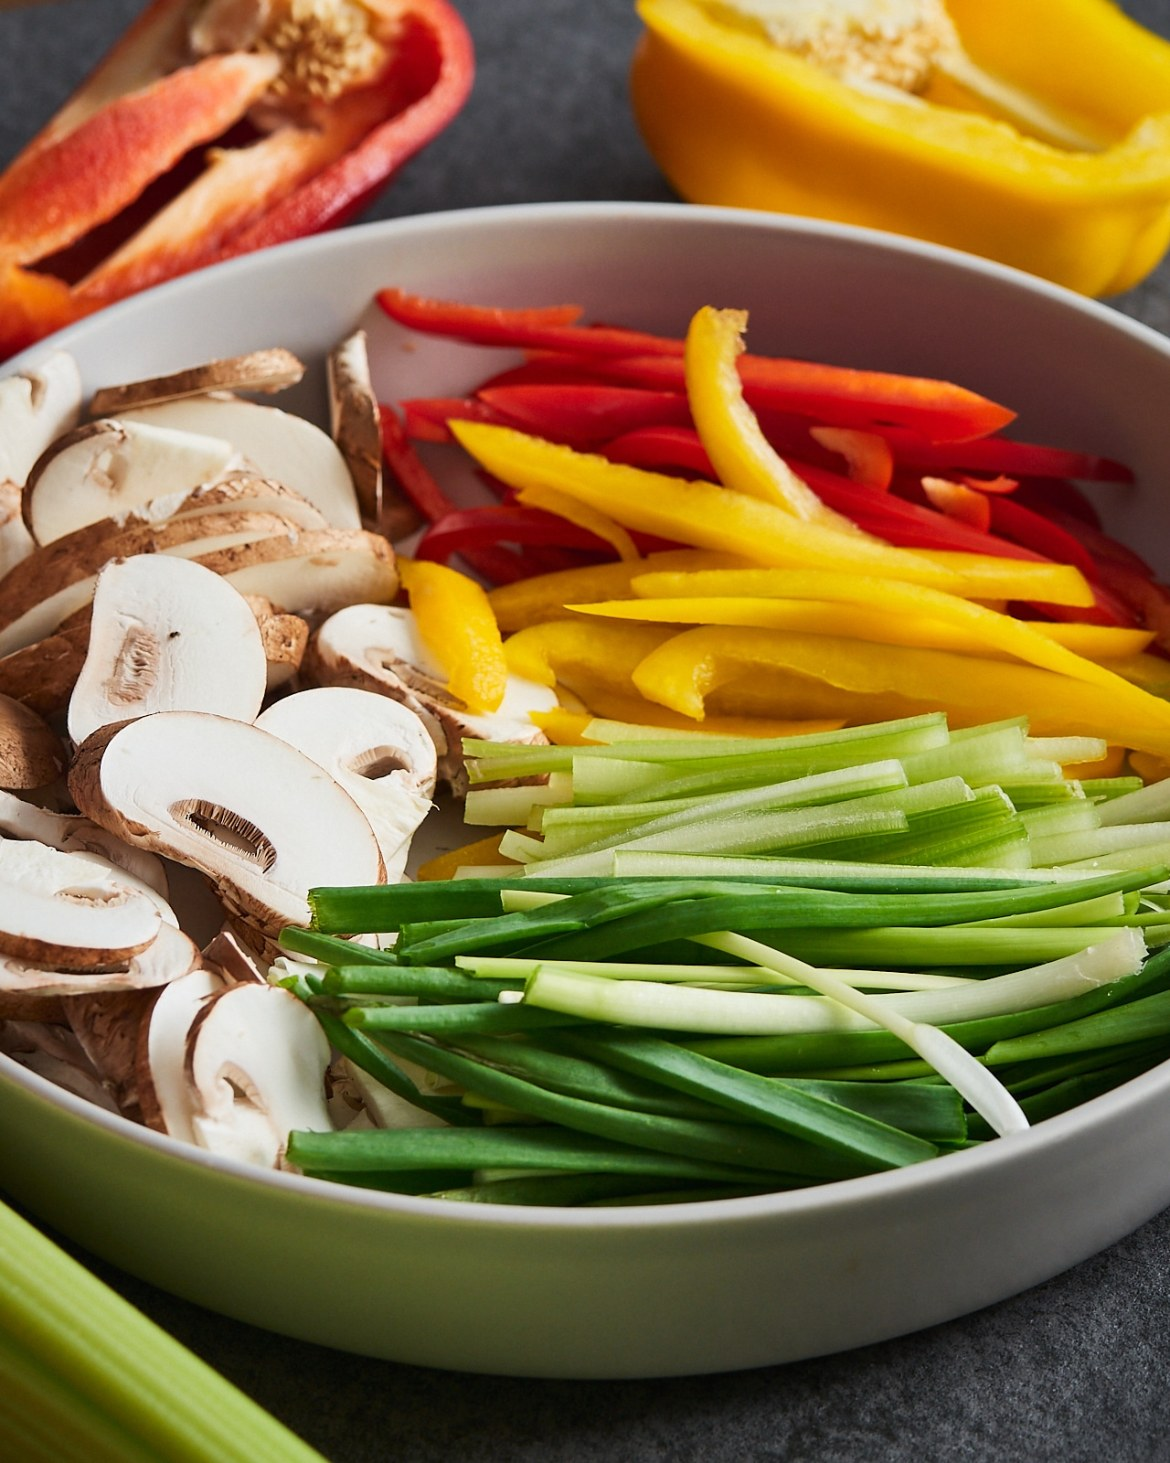 how to slice vegetables stir fry